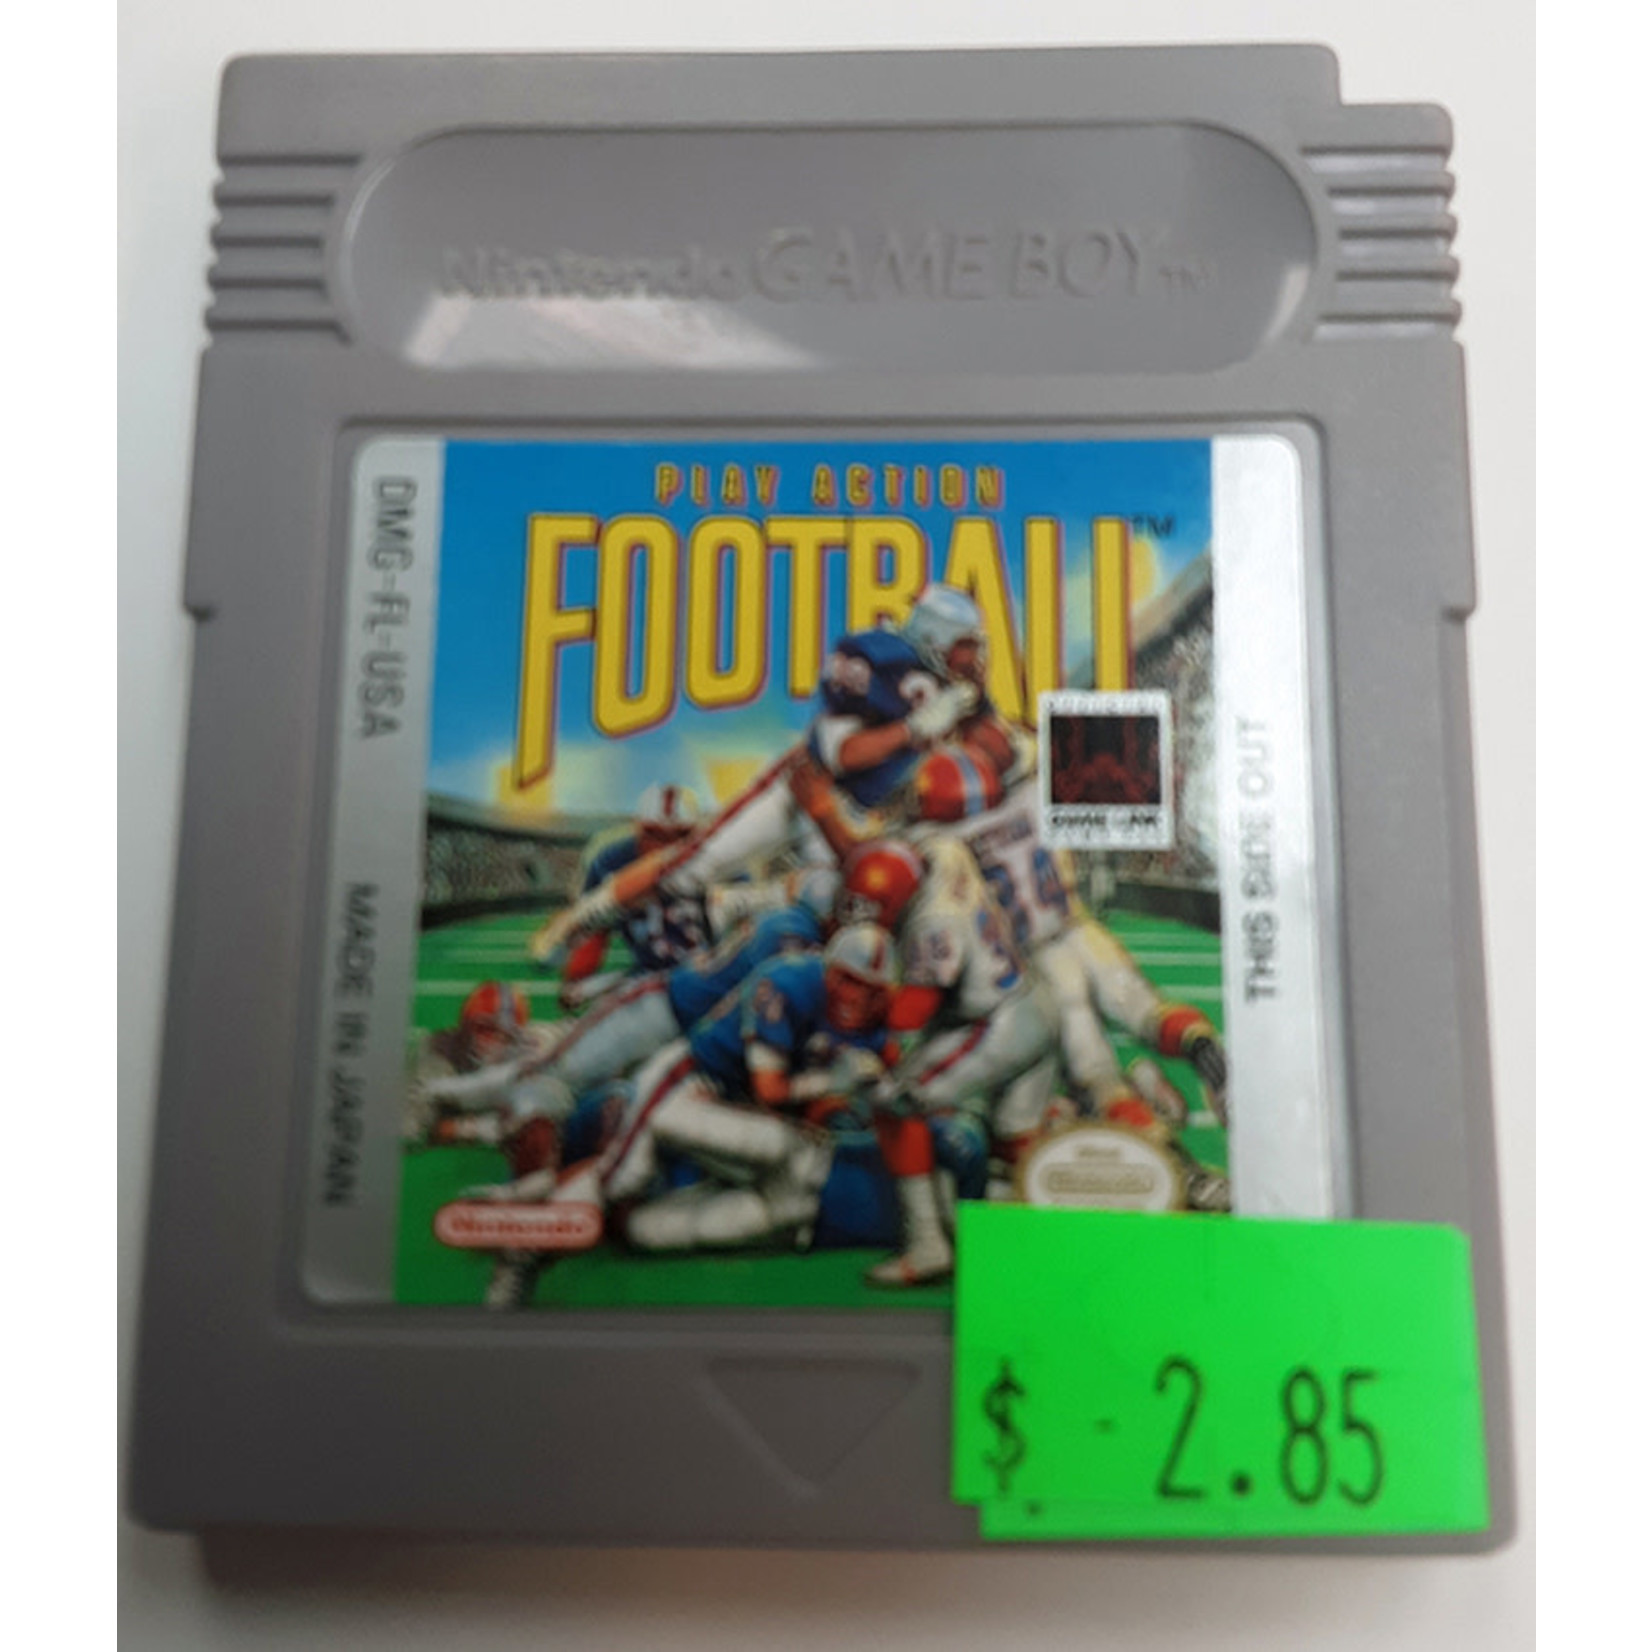 GBu-Play Action Football (cartridge)